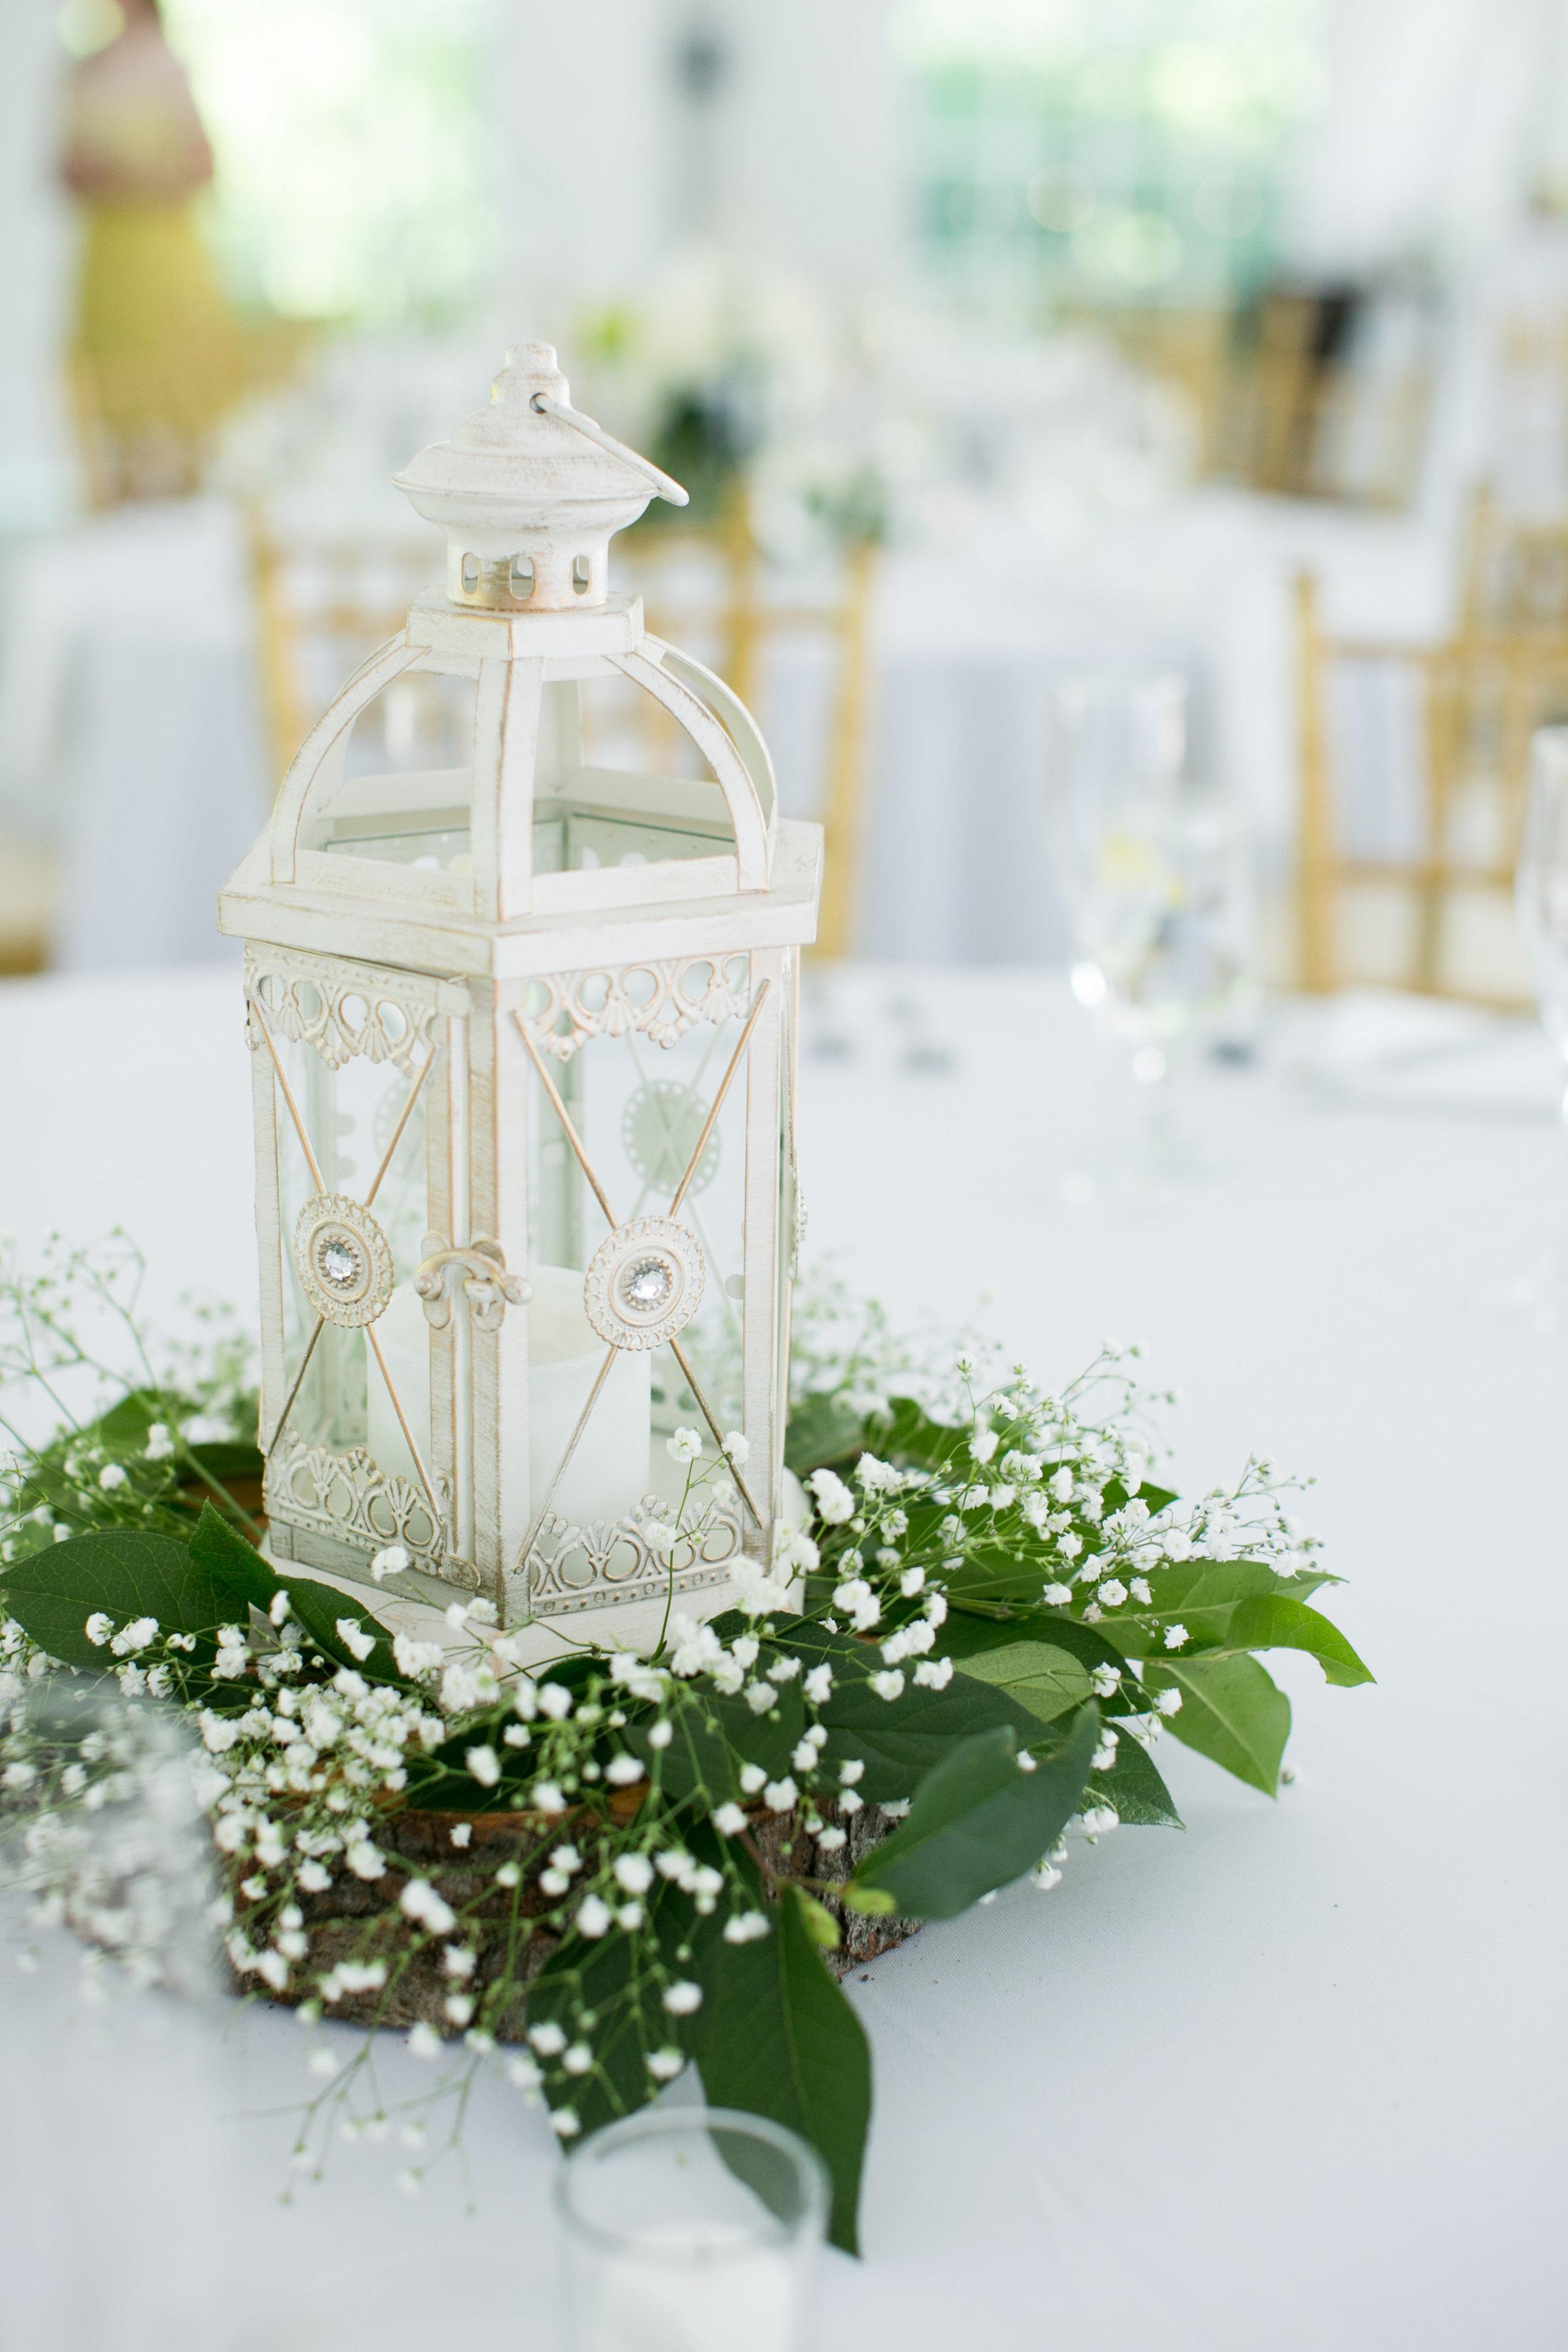 Pure elegance events Tynise Kee dc wedding planner va wedding planner rust manor house leesburg -0049.jpg